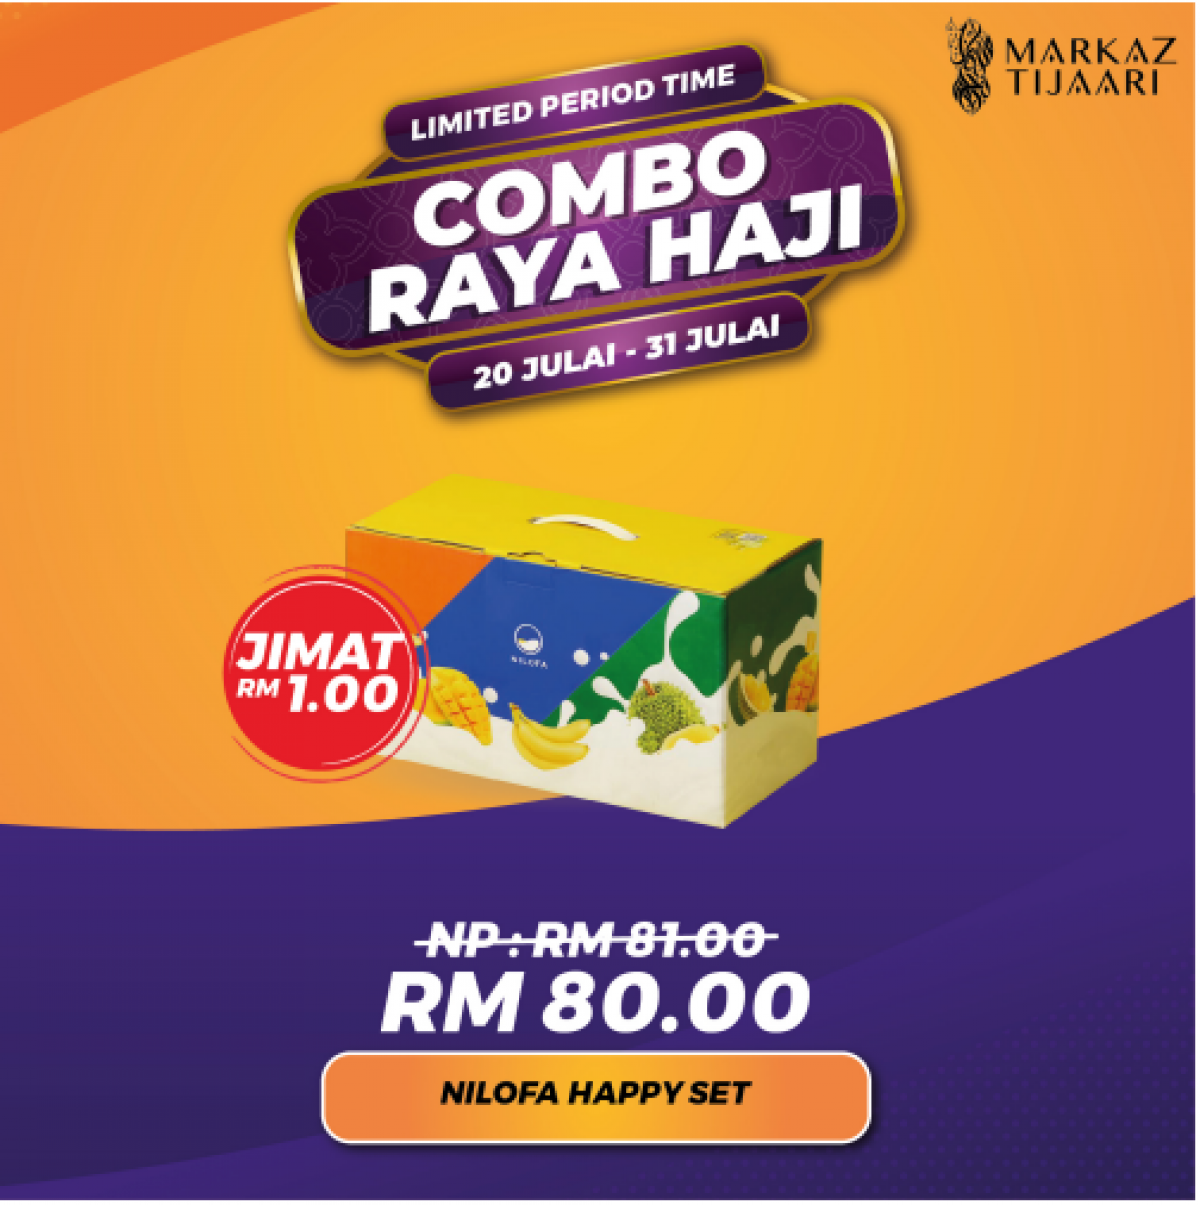 Happy Set Combo Raya Haji - MARKAZ TIJAARI